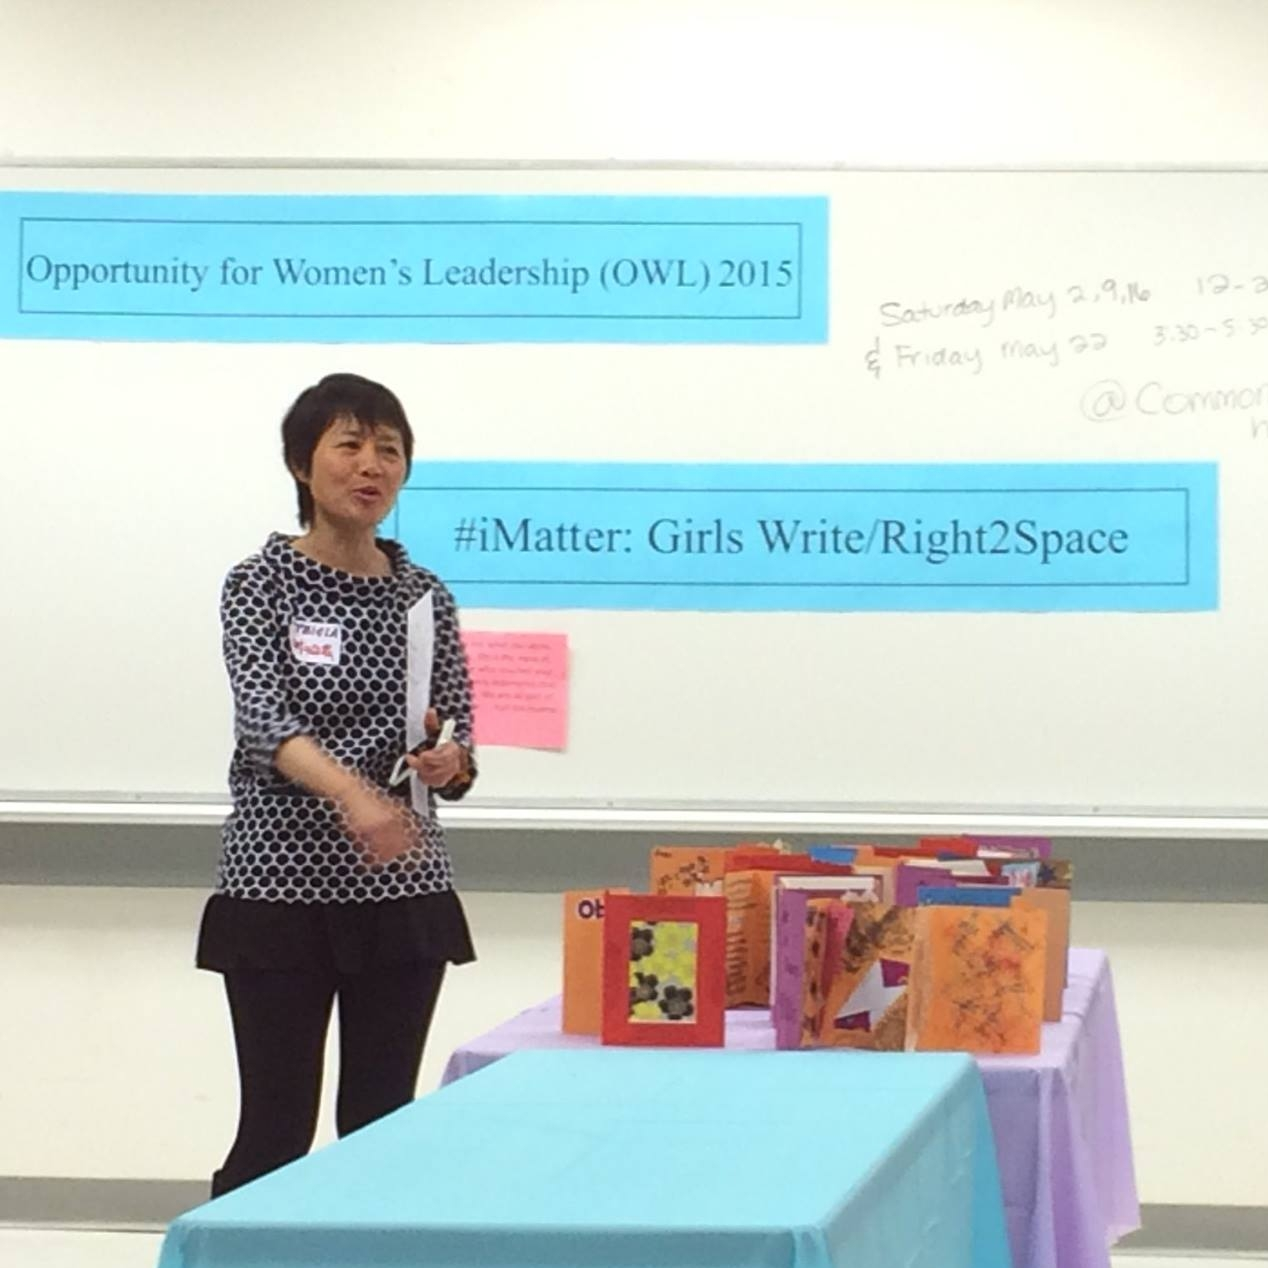 Tricia Women's Leadership event